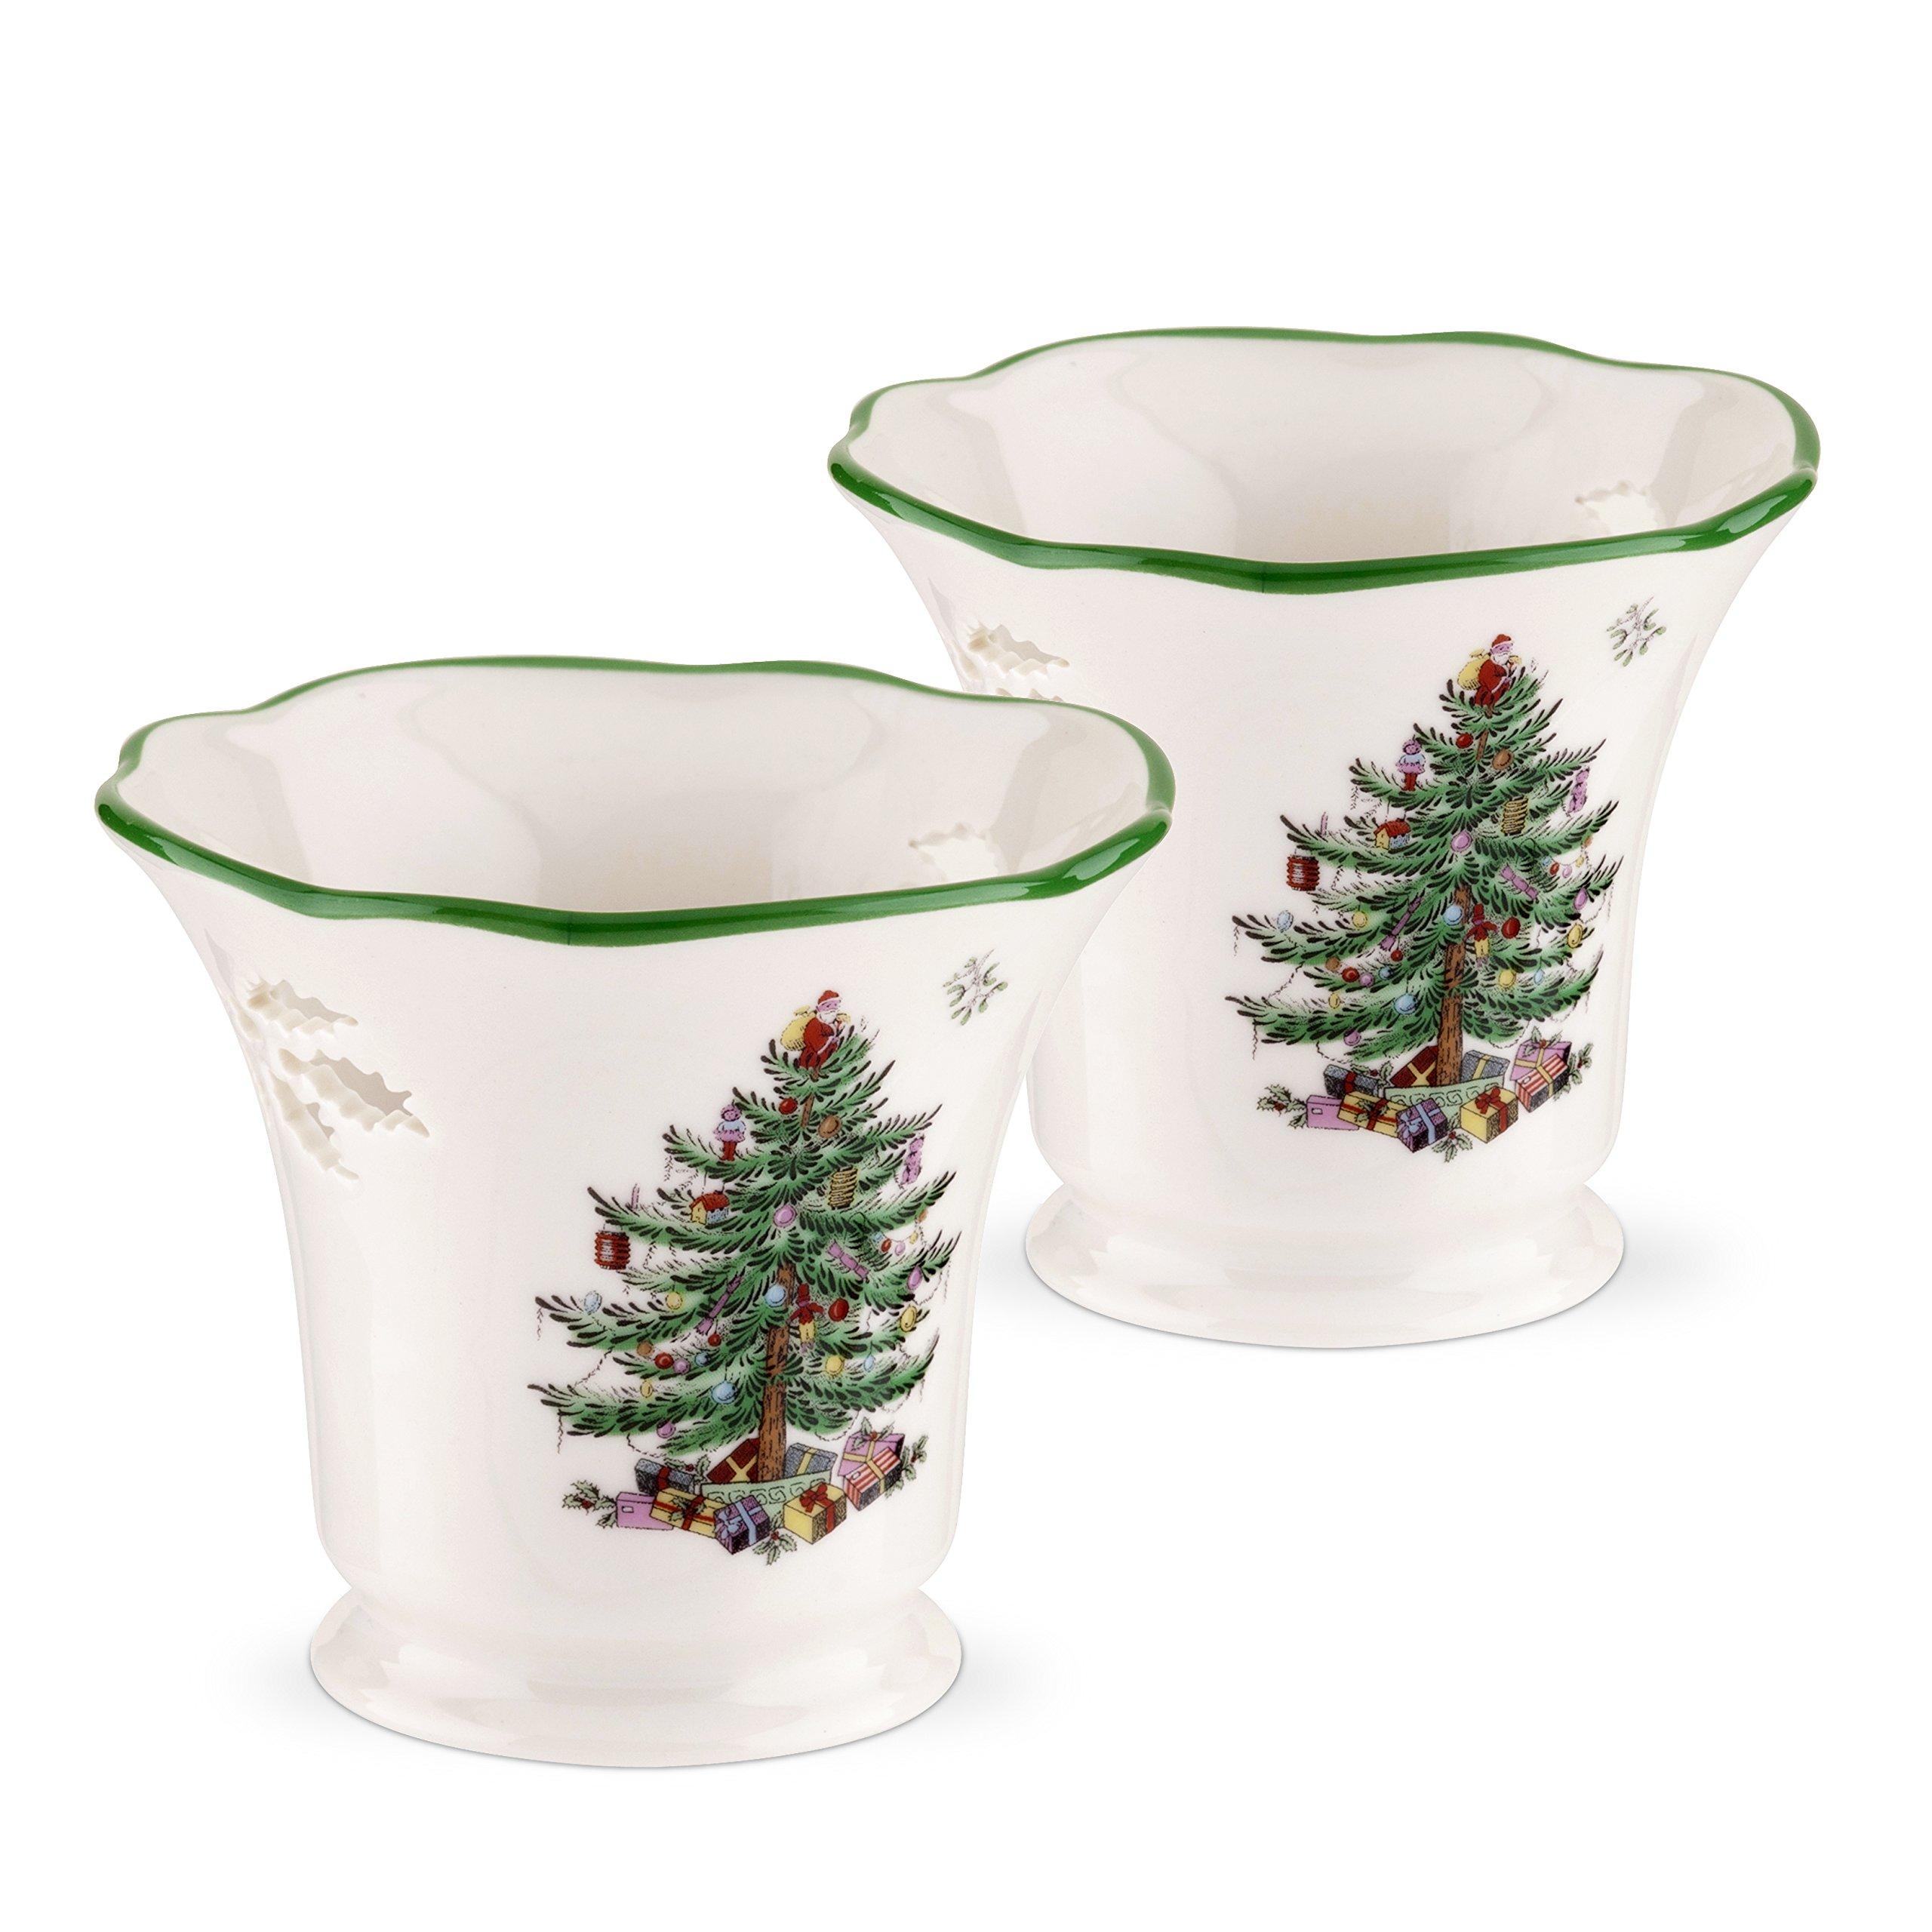 Spode Christmas Tree Pierced Tea Light Holder with Tea Lights, Set of 2 by Spode